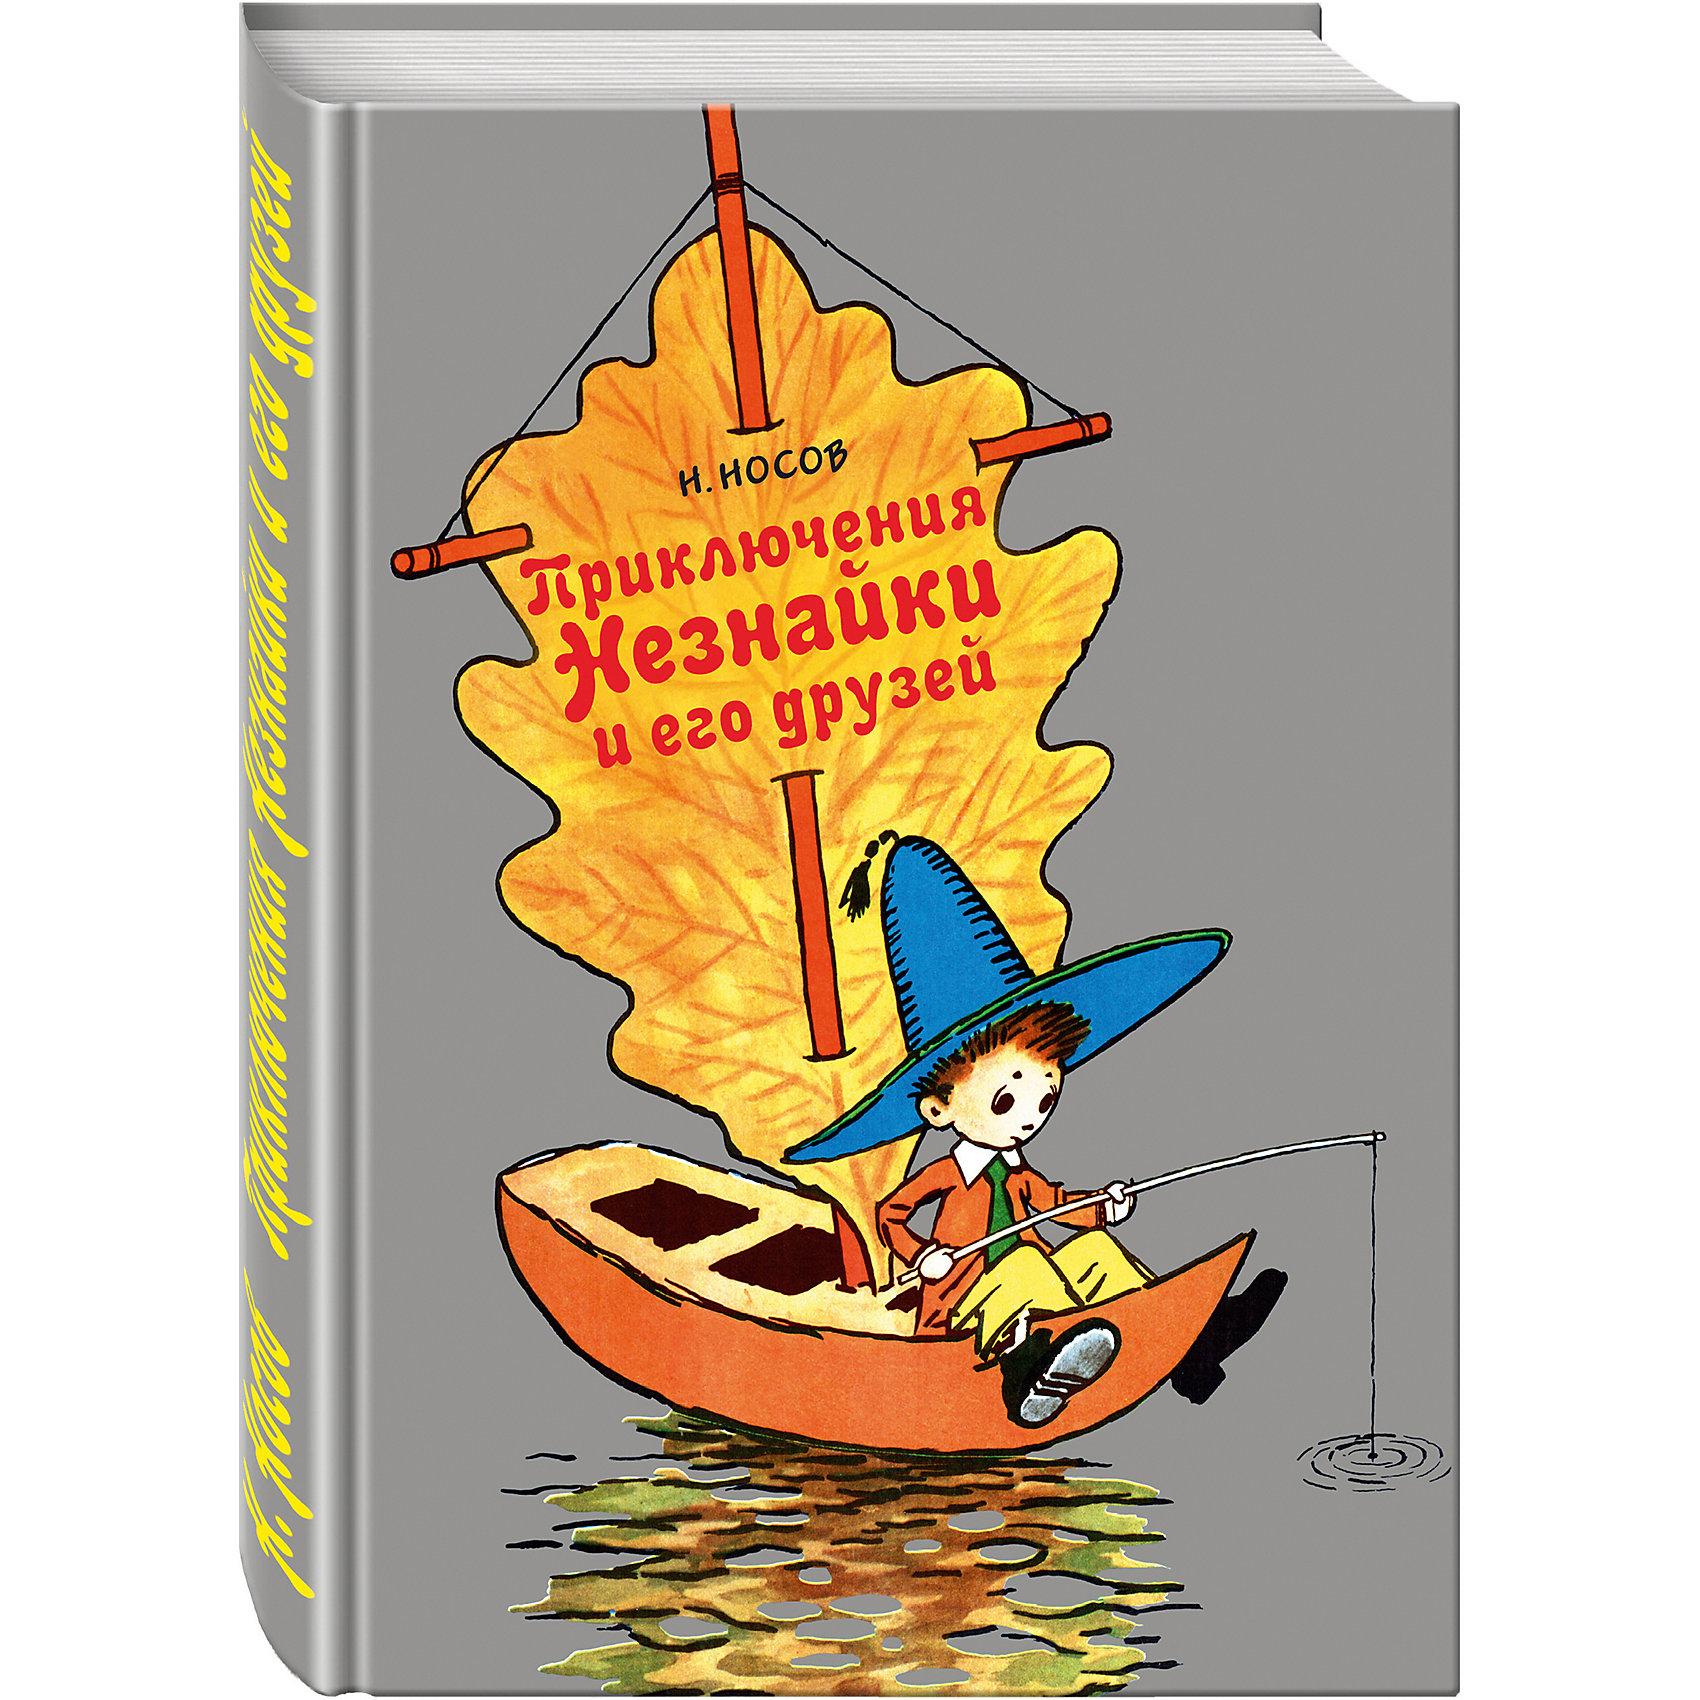 Эксмо Приключения Незнайки и его друзей, Н.Н. Носов книги эксмо последний космический шанс